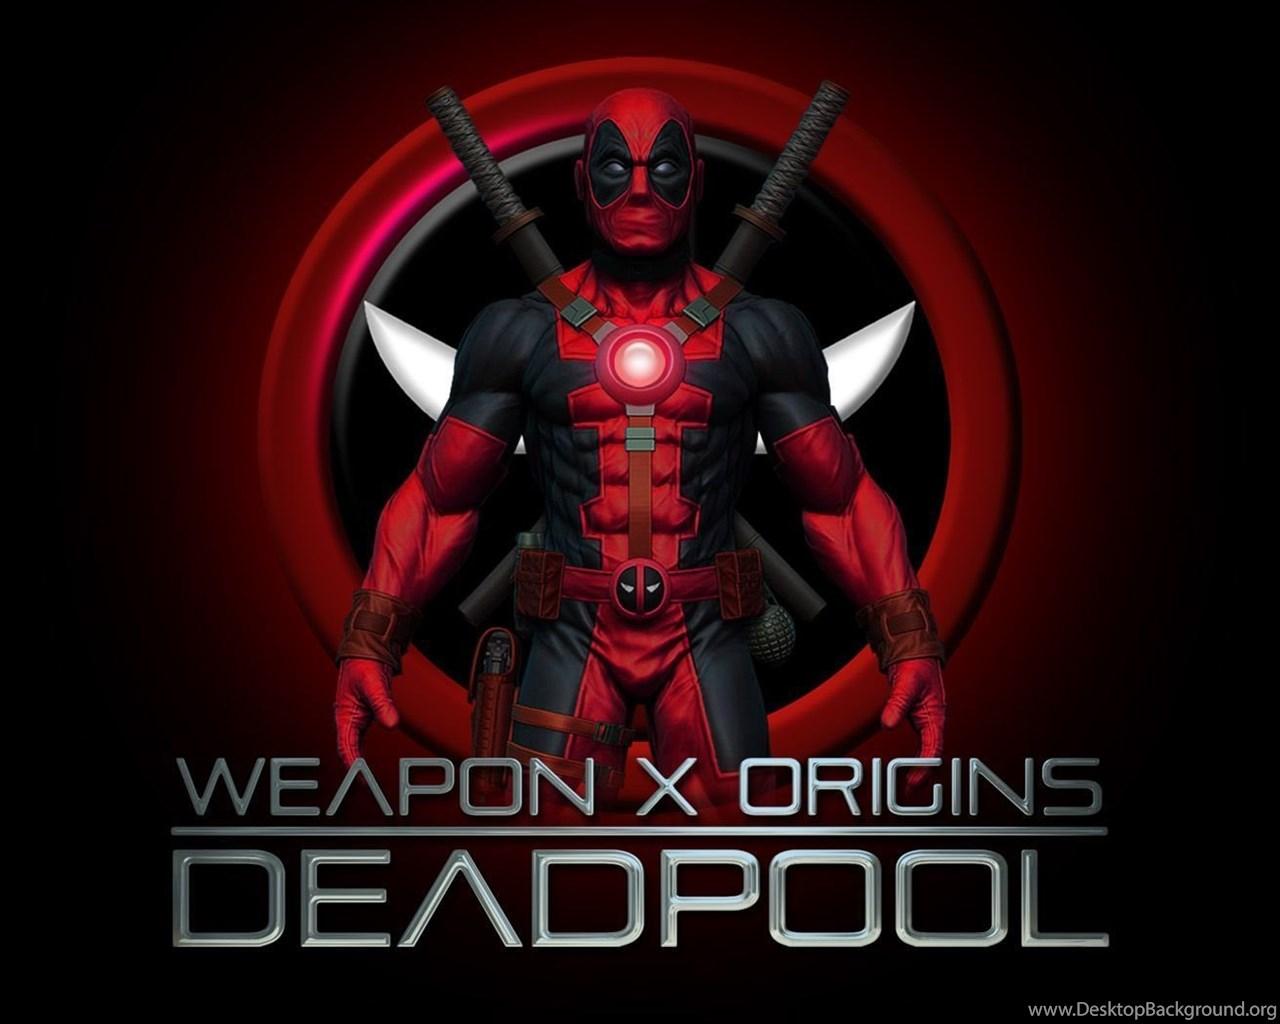 717 Deadpool Hd Wallpapers Desktop Background